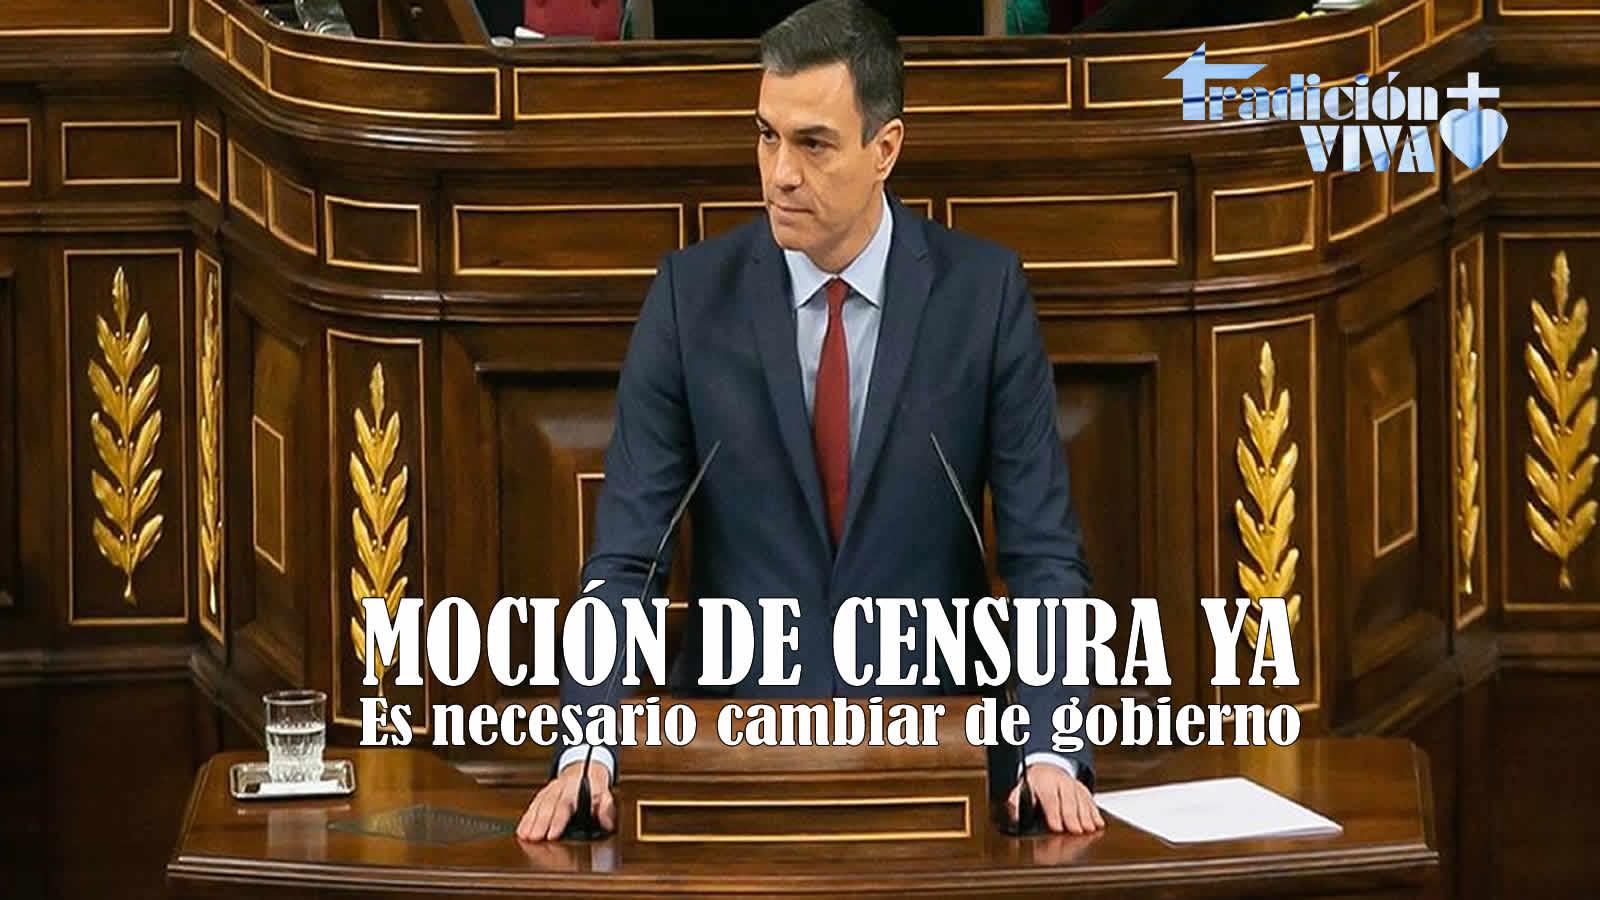 https://www.tradicionviva.es/wp-content/uploads/2020/04/2020-03-06-mocion-de-censura.jpg